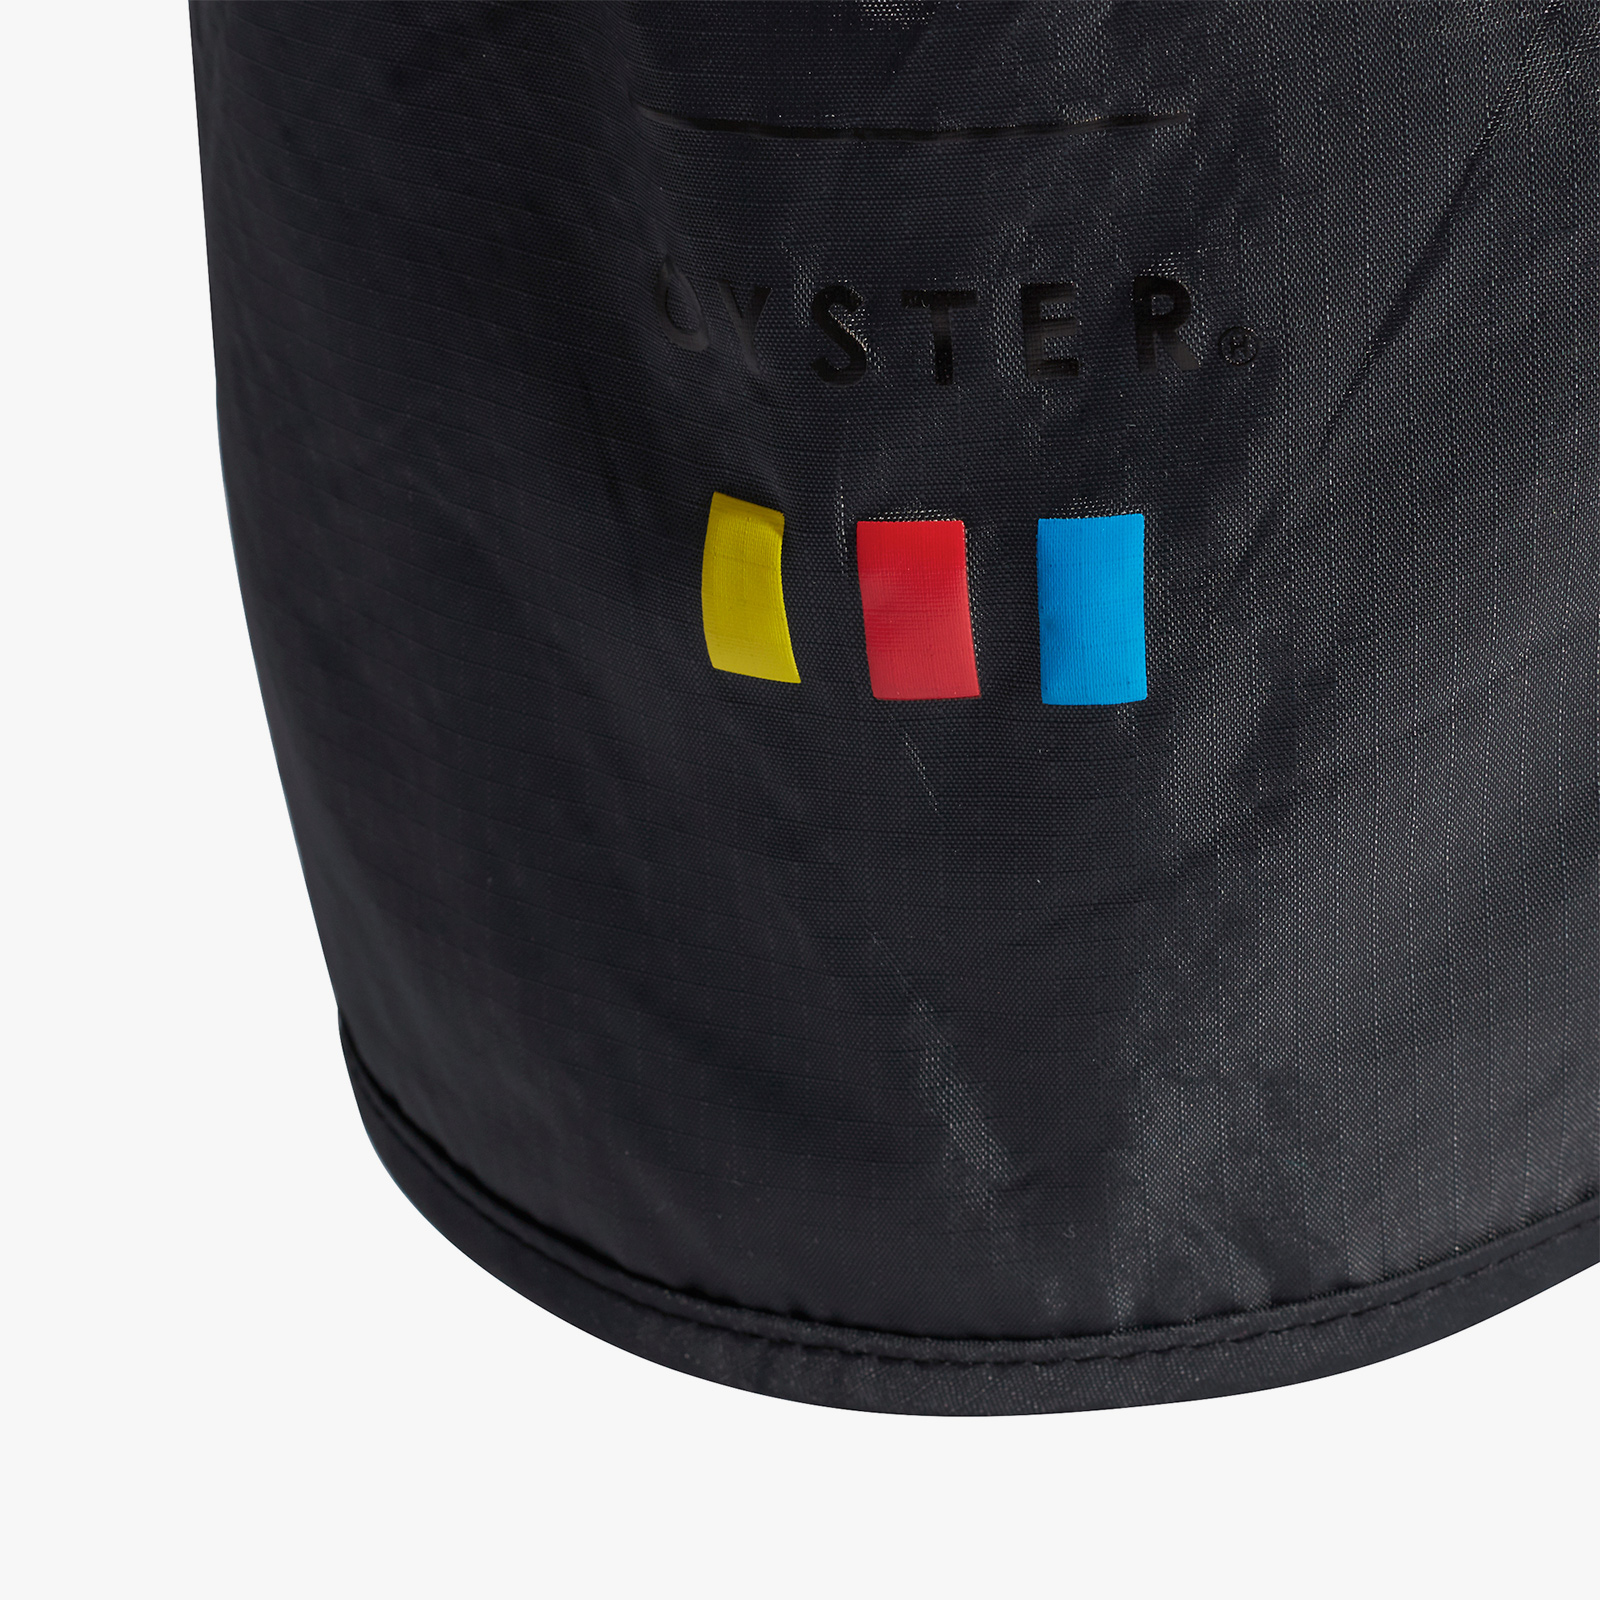 289e2f05c43 adidas 48 Hour Cap x Oyster - Dp0246 - Sneakersnstuff